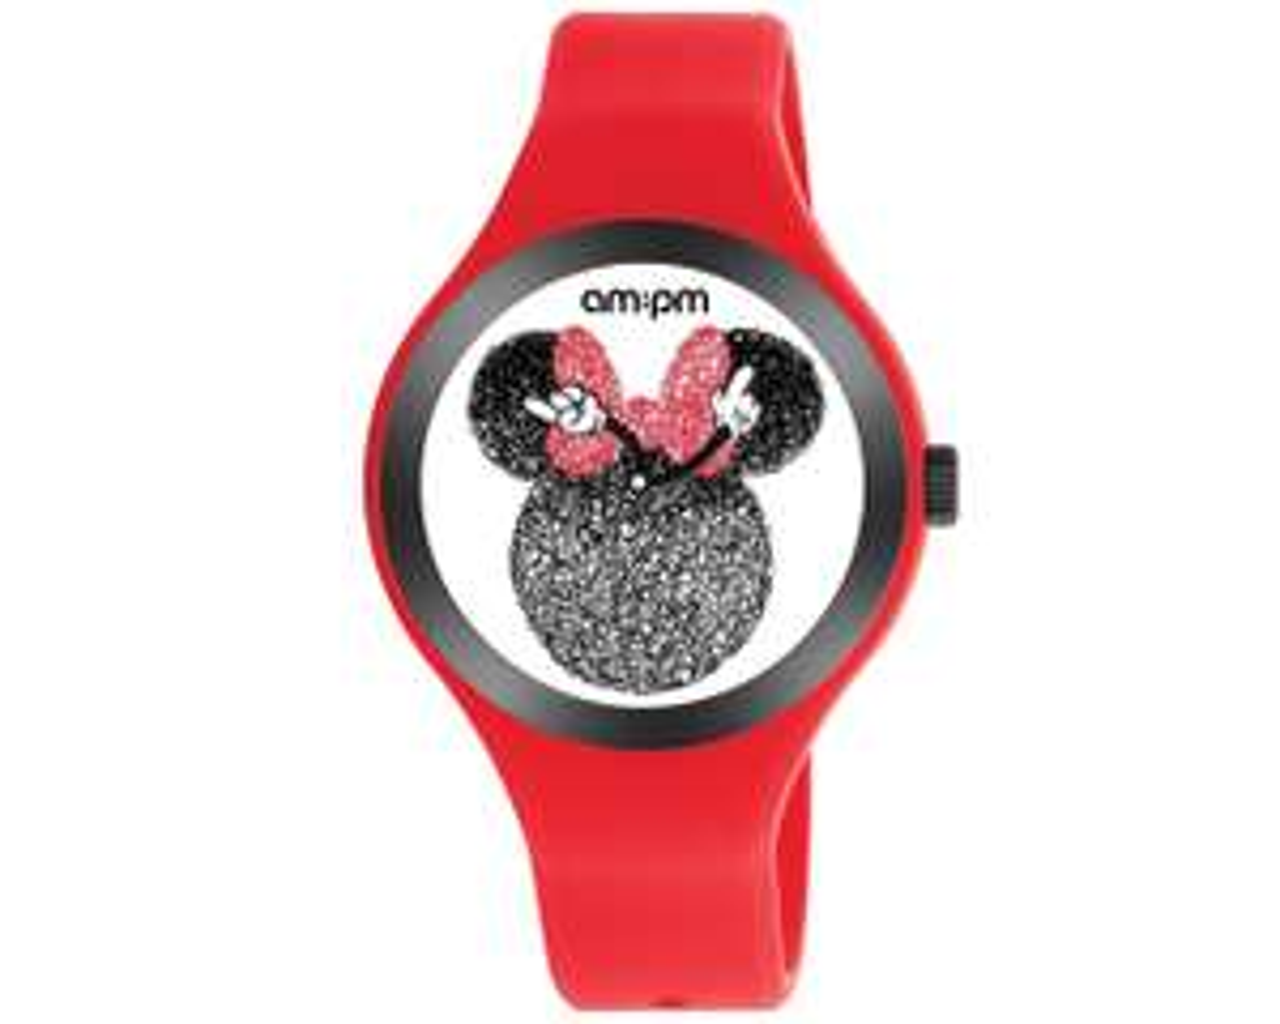 Zegarek Disney Myszka Minnie AM PM Apart